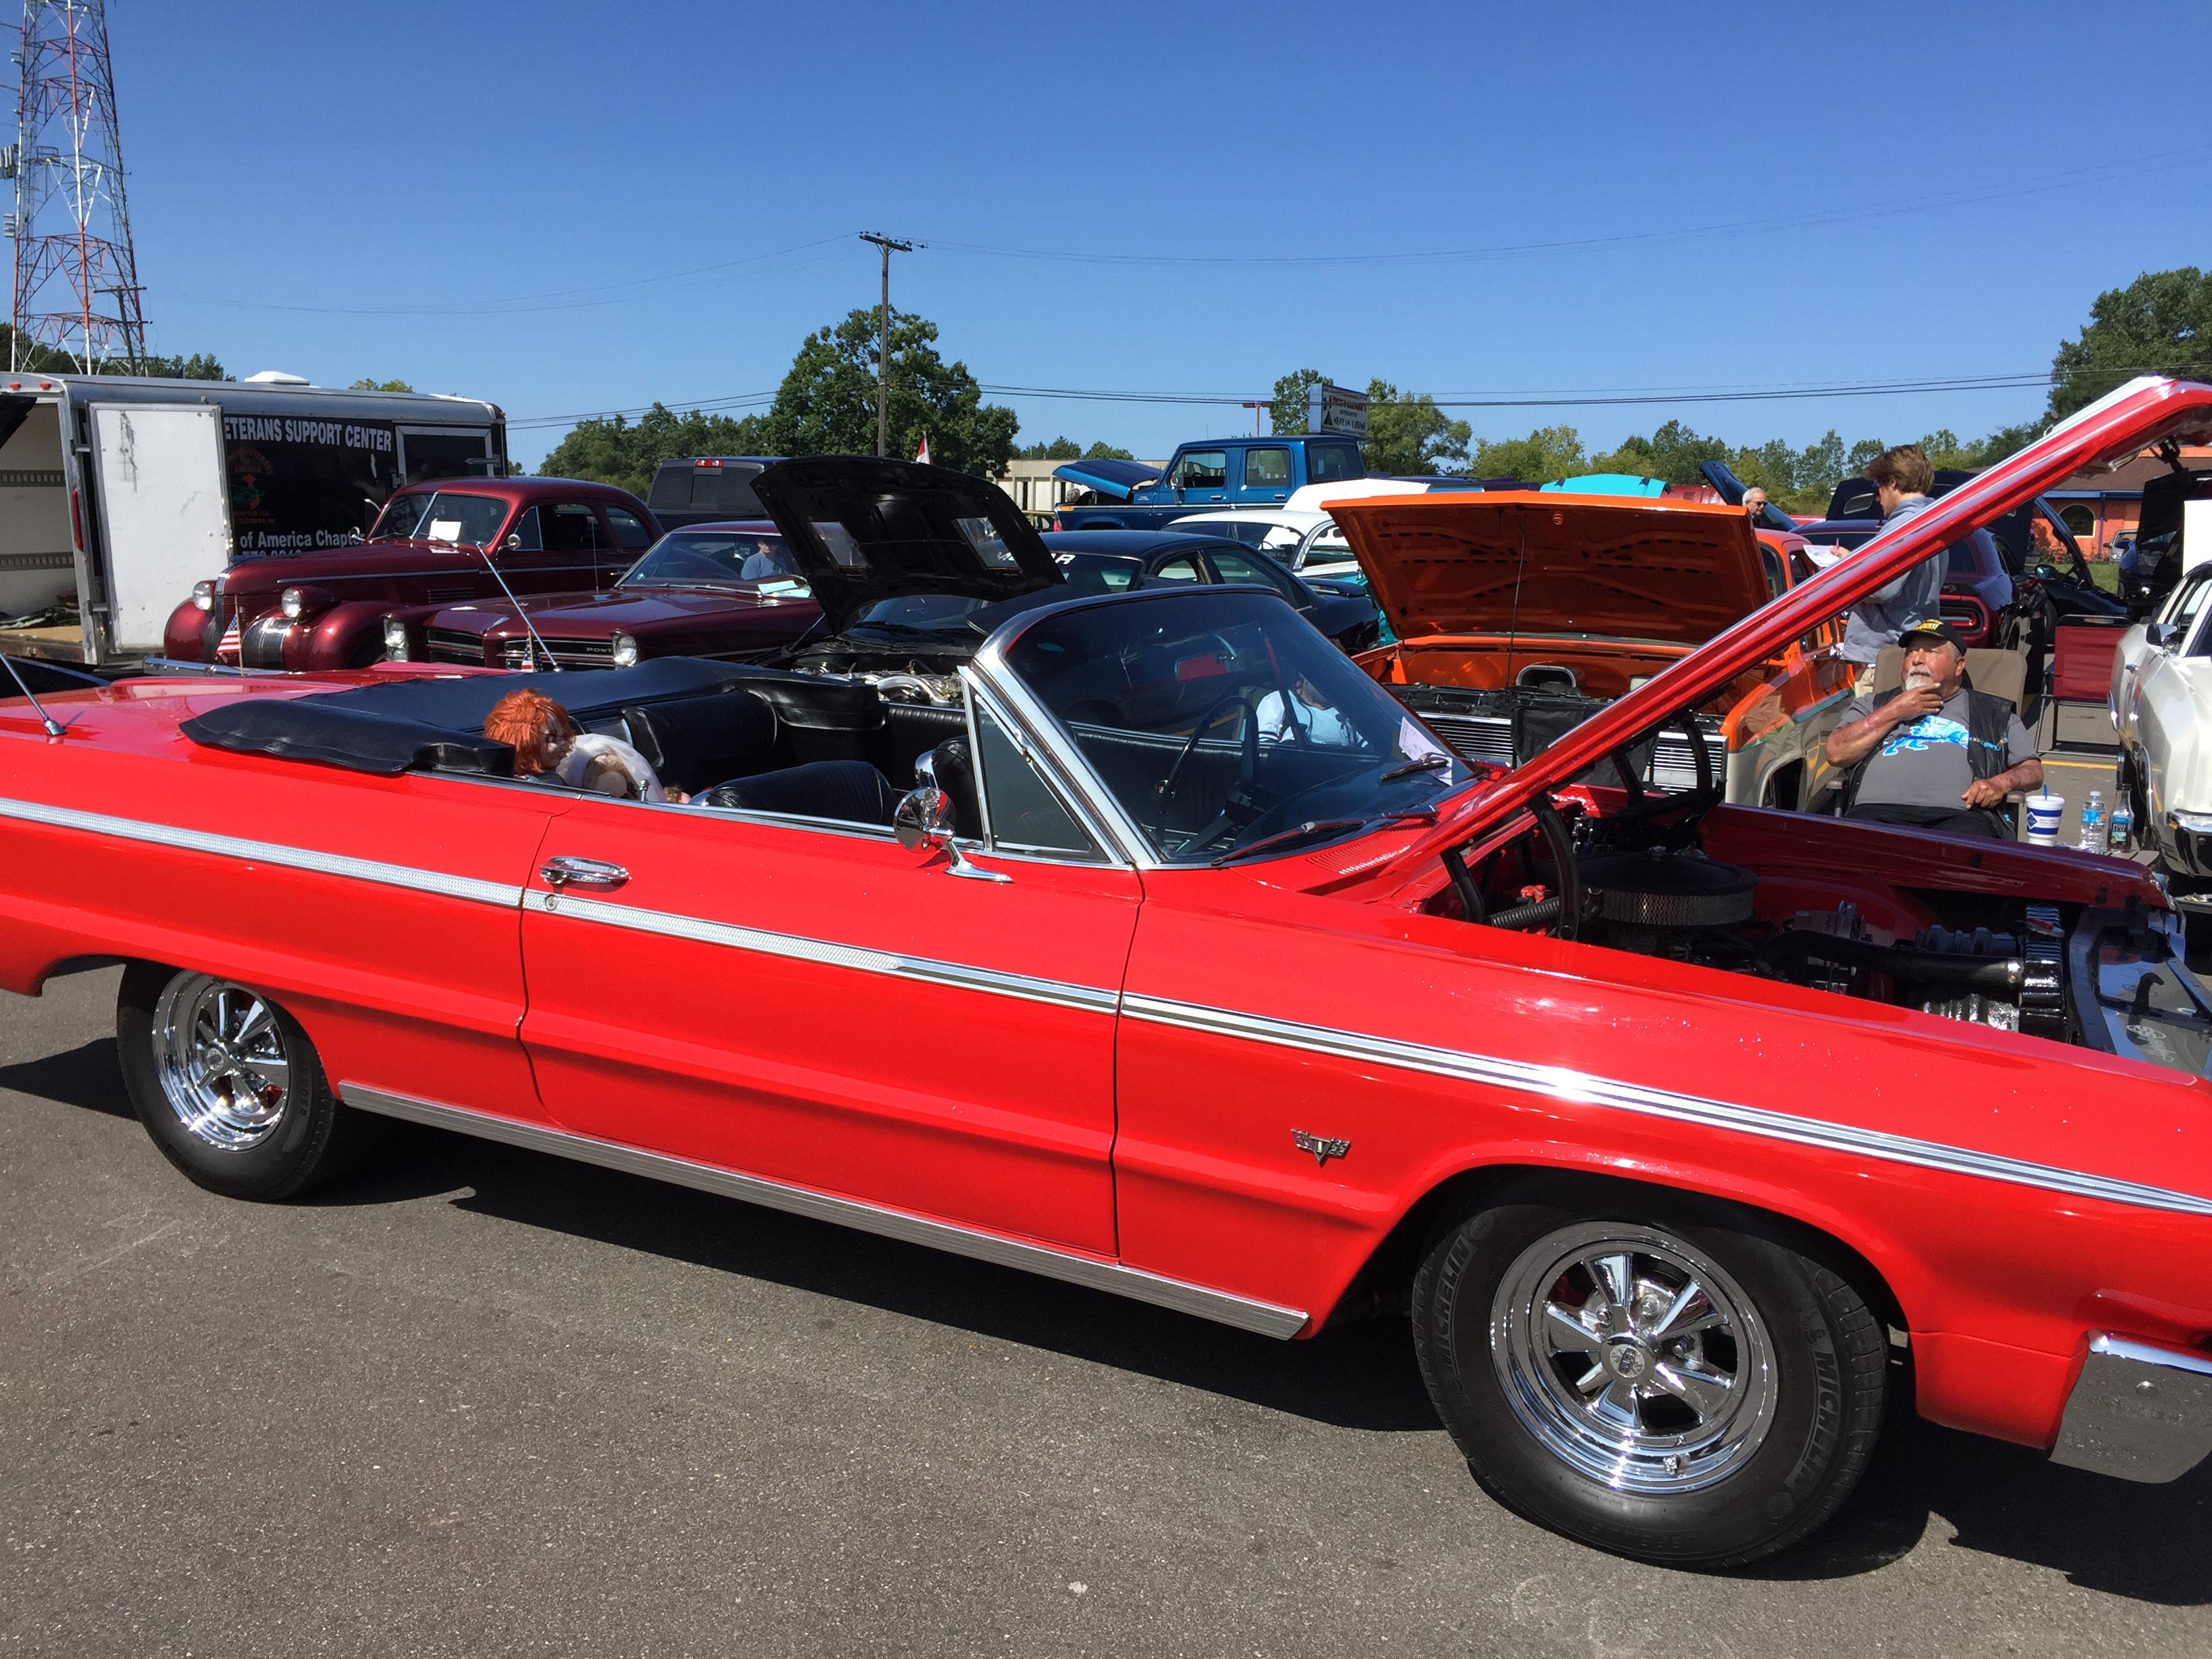 Orion Classic Car Club